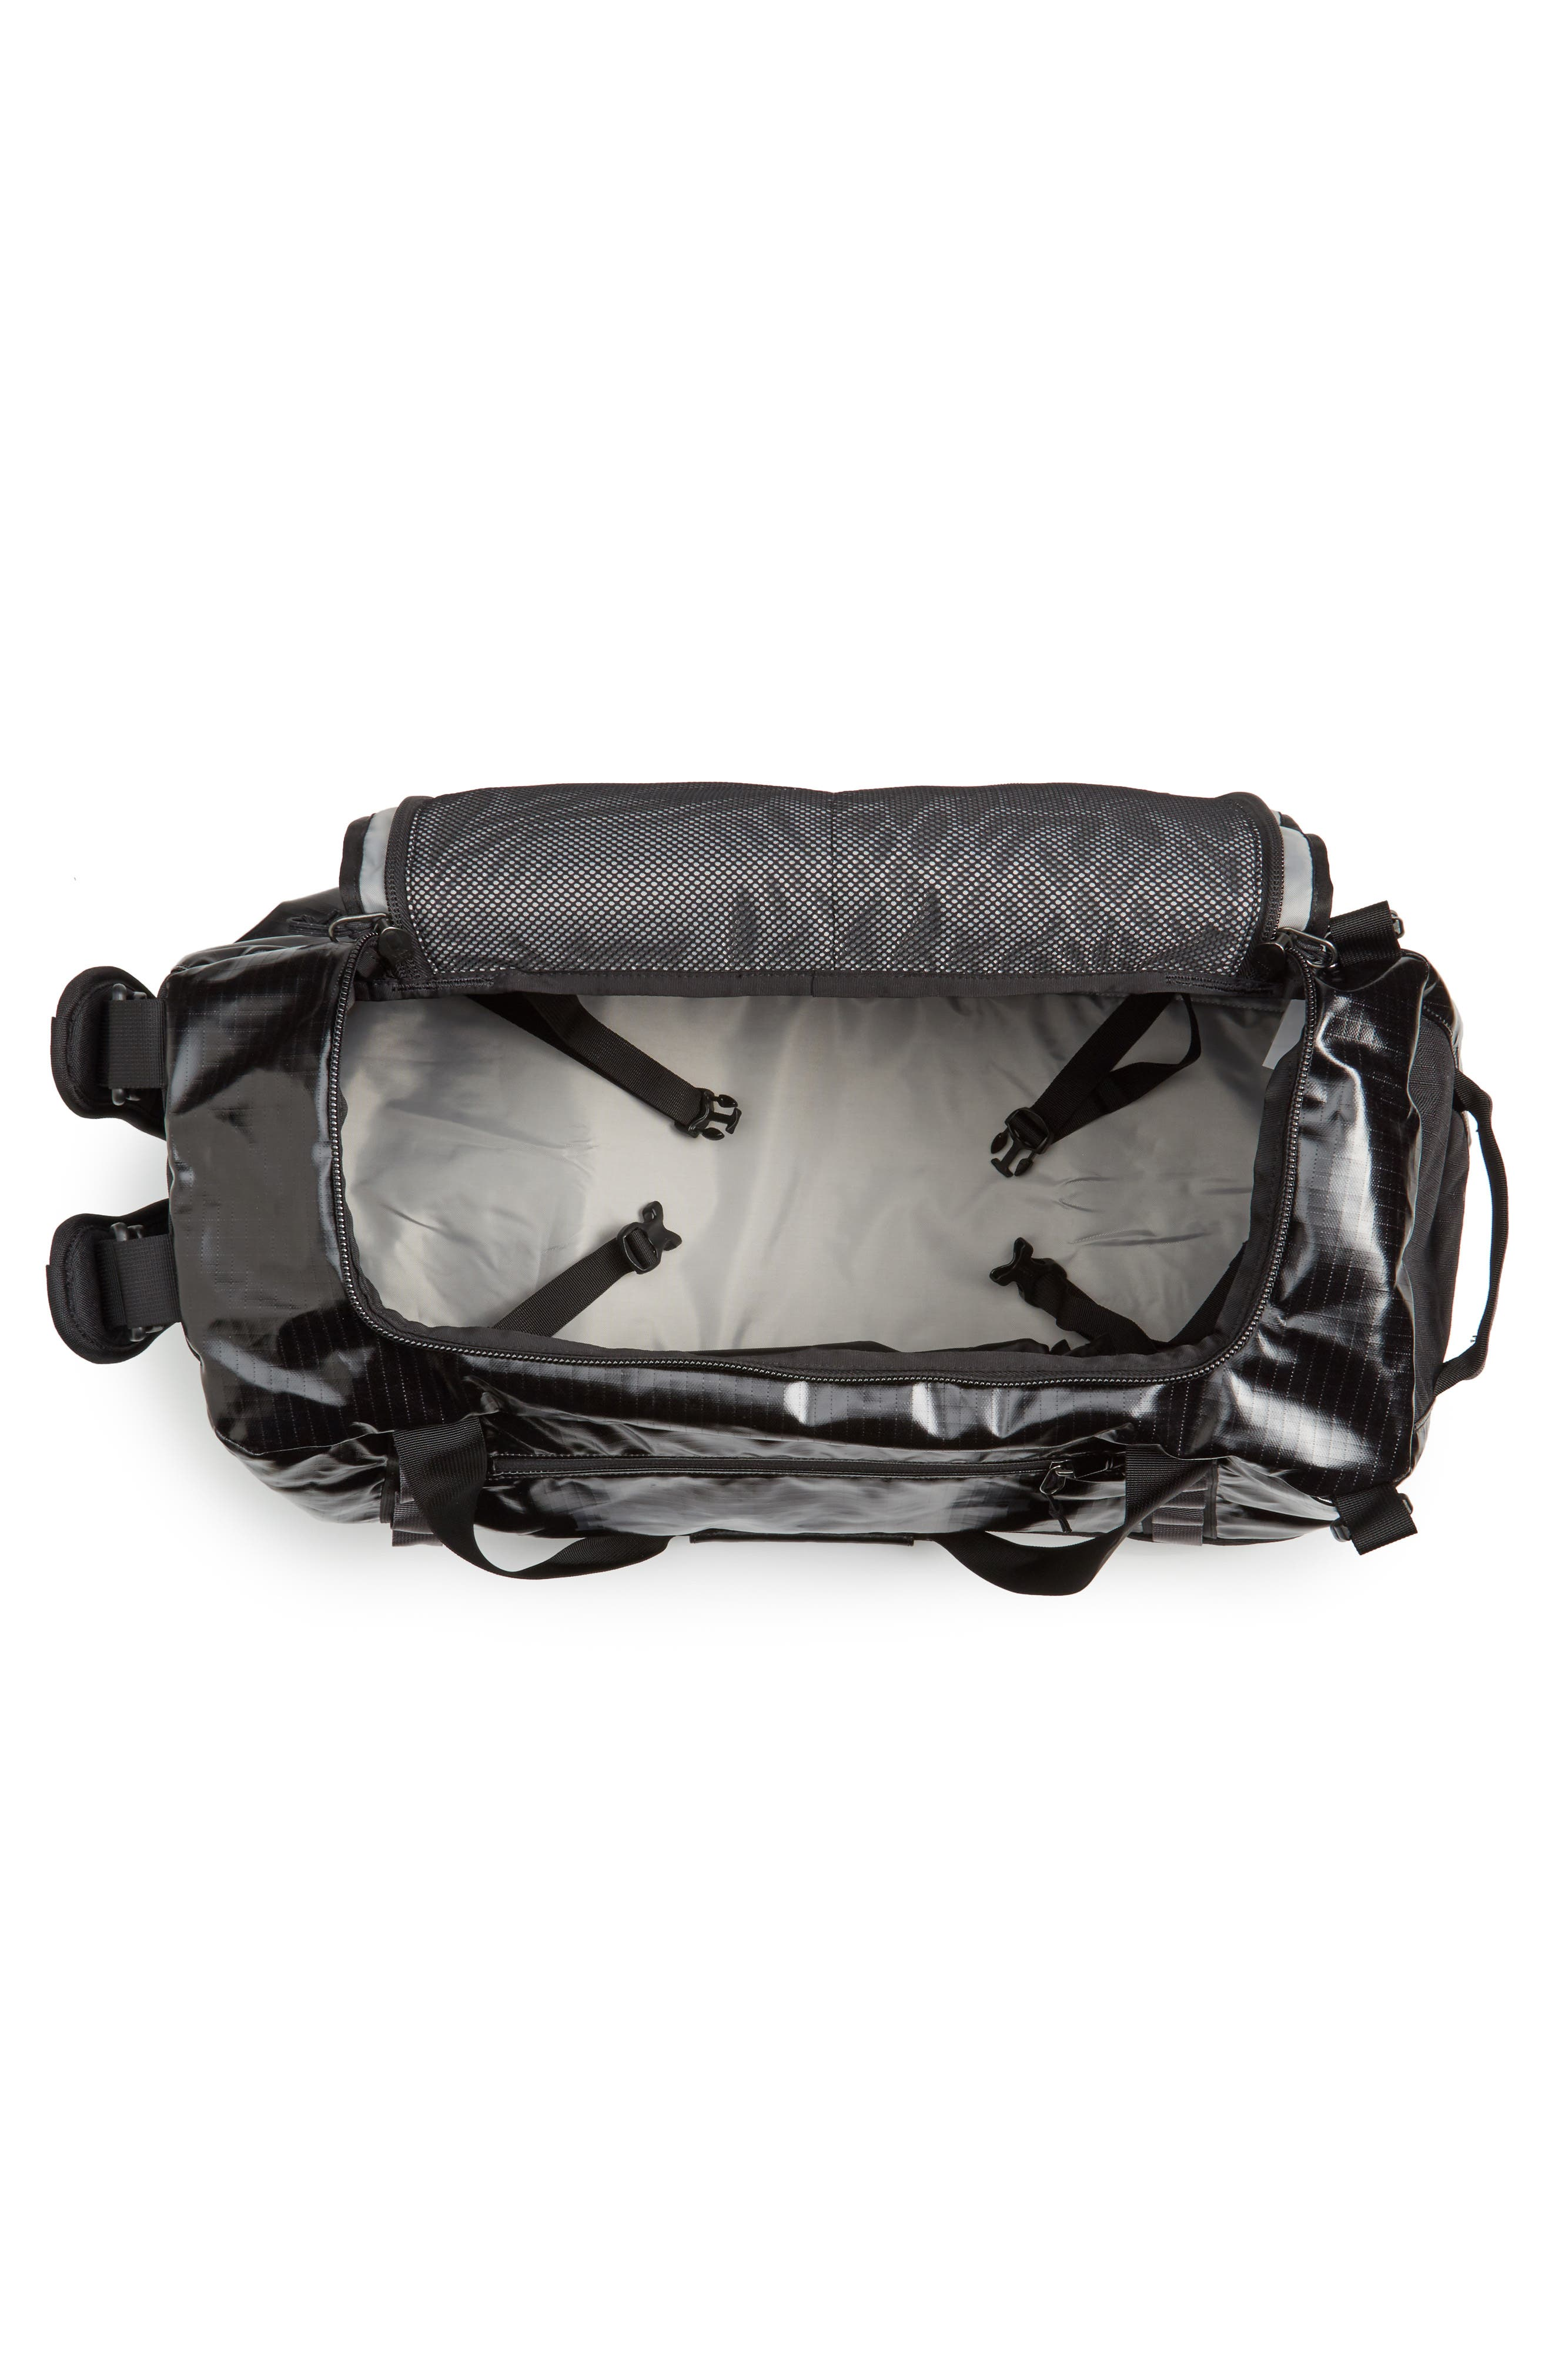 PATAGONIA, Black Hole Water Repellent 60-Liter Duffle Bag, Alternate thumbnail 4, color, BLACK